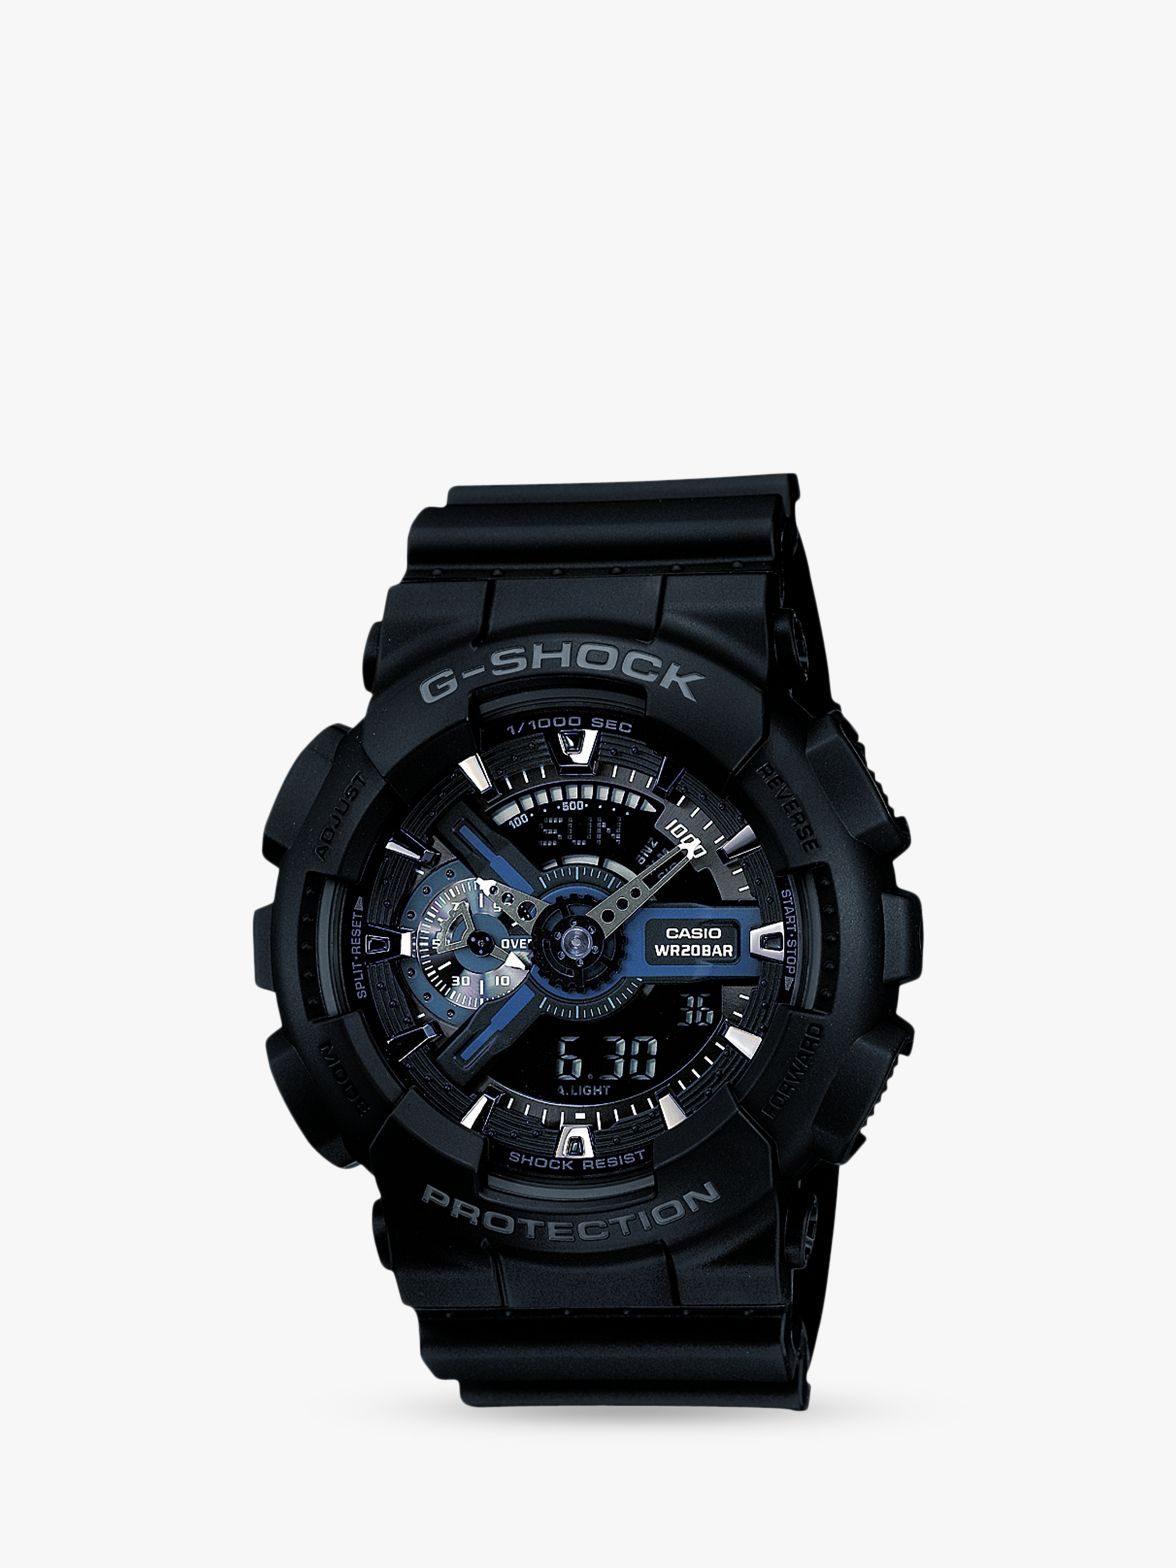 Casio Casio GA-110-1BER Men's G-Shock Resin Strap Watch, Black